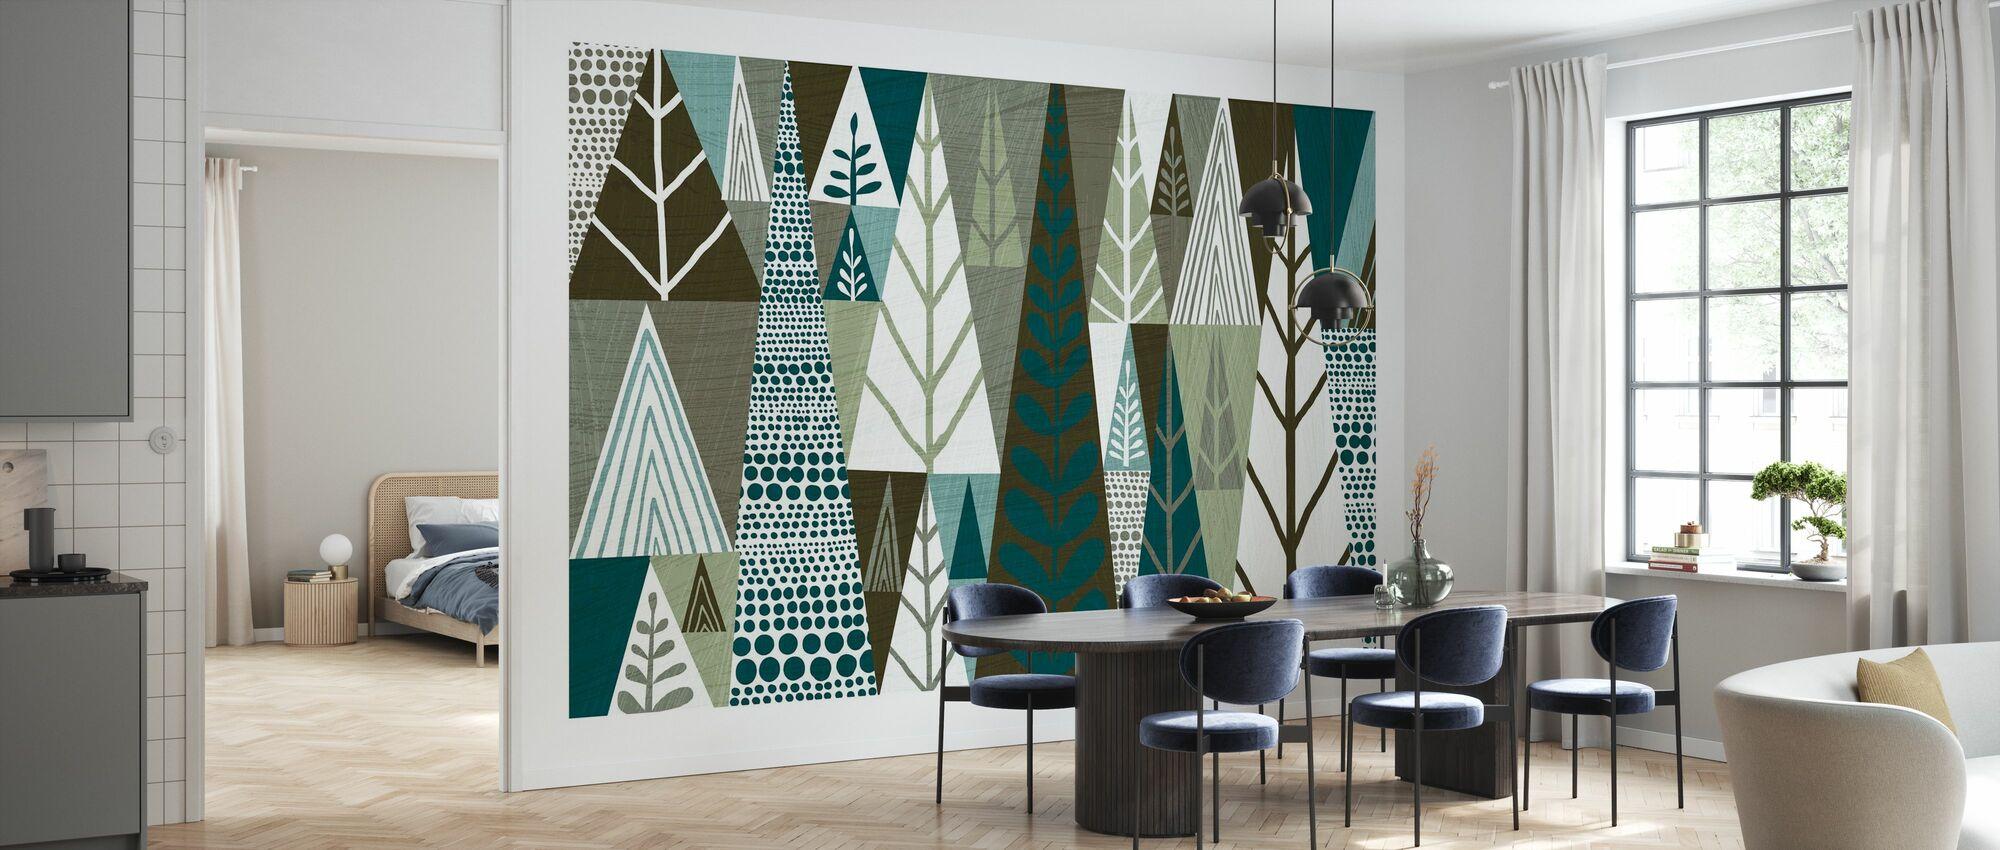 Geometric Forest - Wallpaper - Kitchen